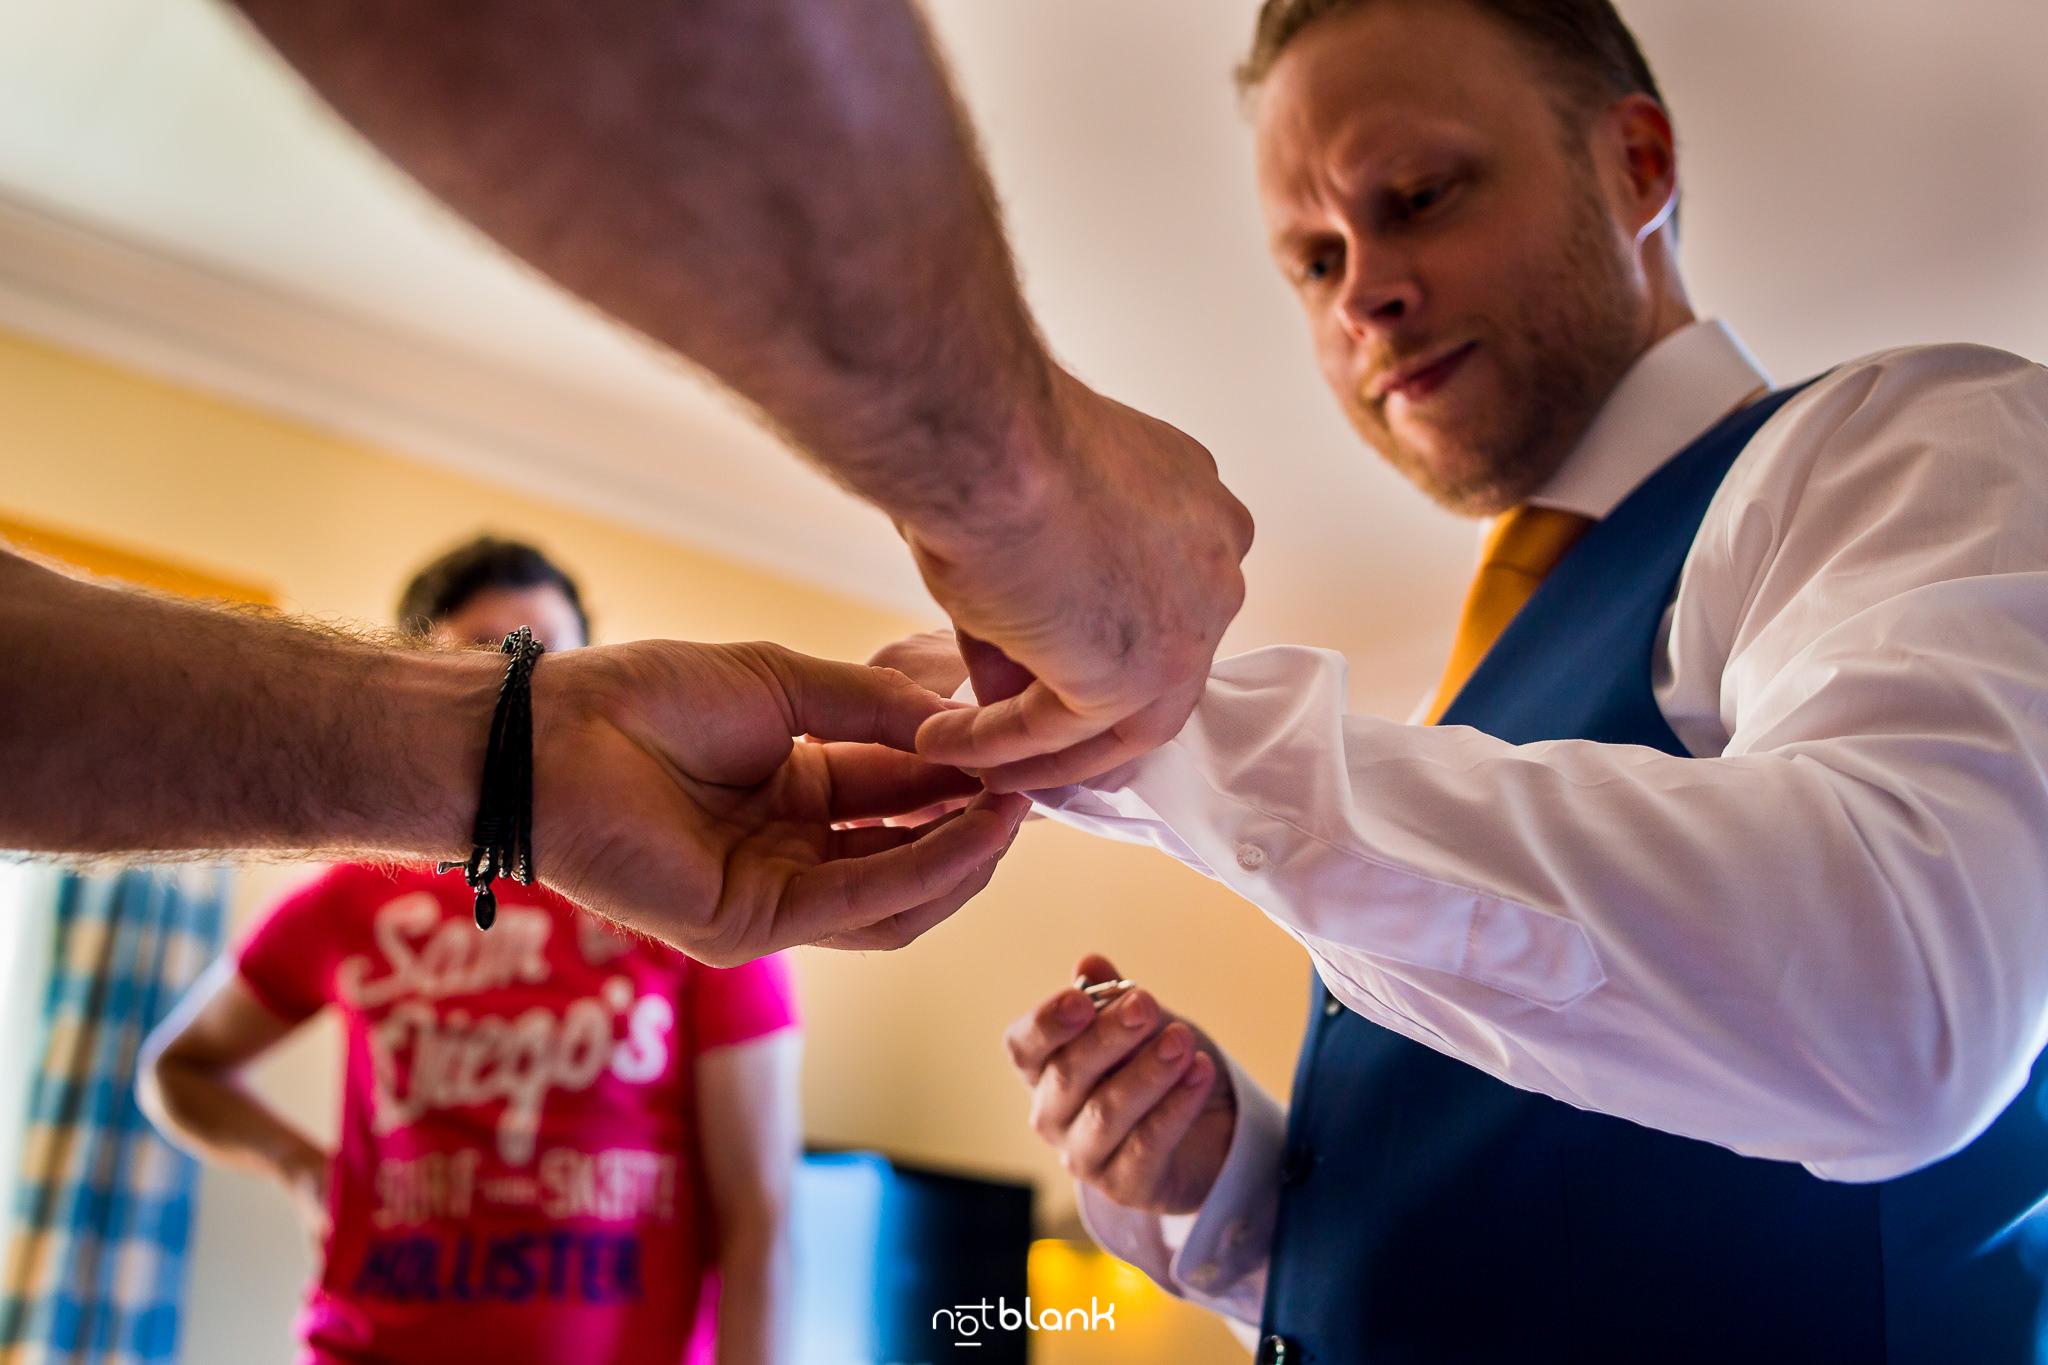 Boda-Maite-David-Preparativos-Novio. Reportaje realizado por Notblank fotógrafos de boda